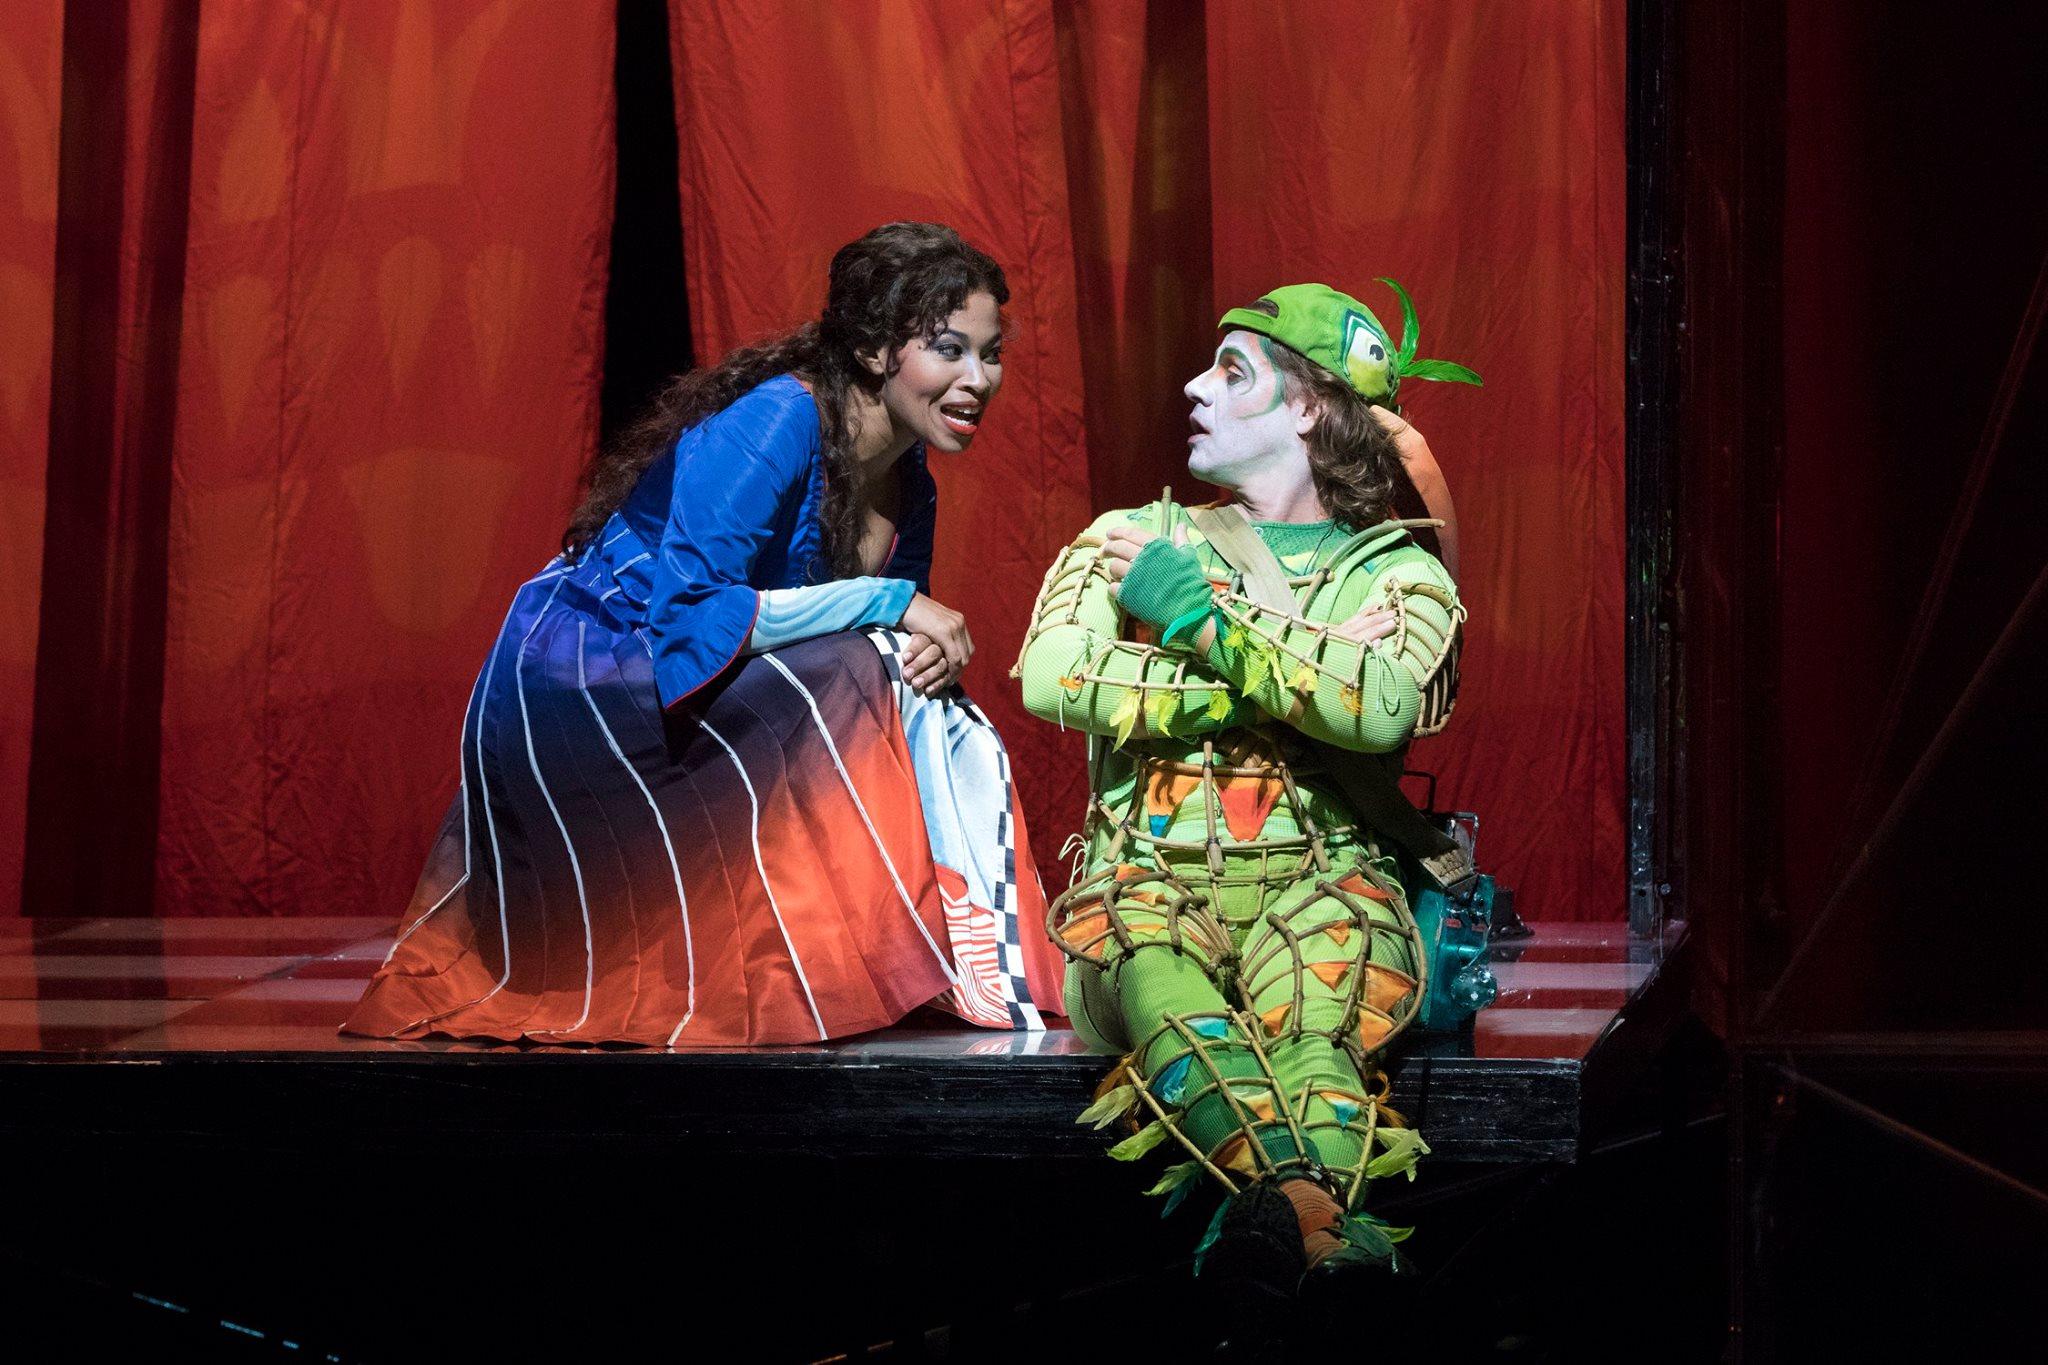 Golda Schult z as Pamina and Markus Werba as Papageno. Photo by Richard Termine; courtesy of the Metropolitan Opera.